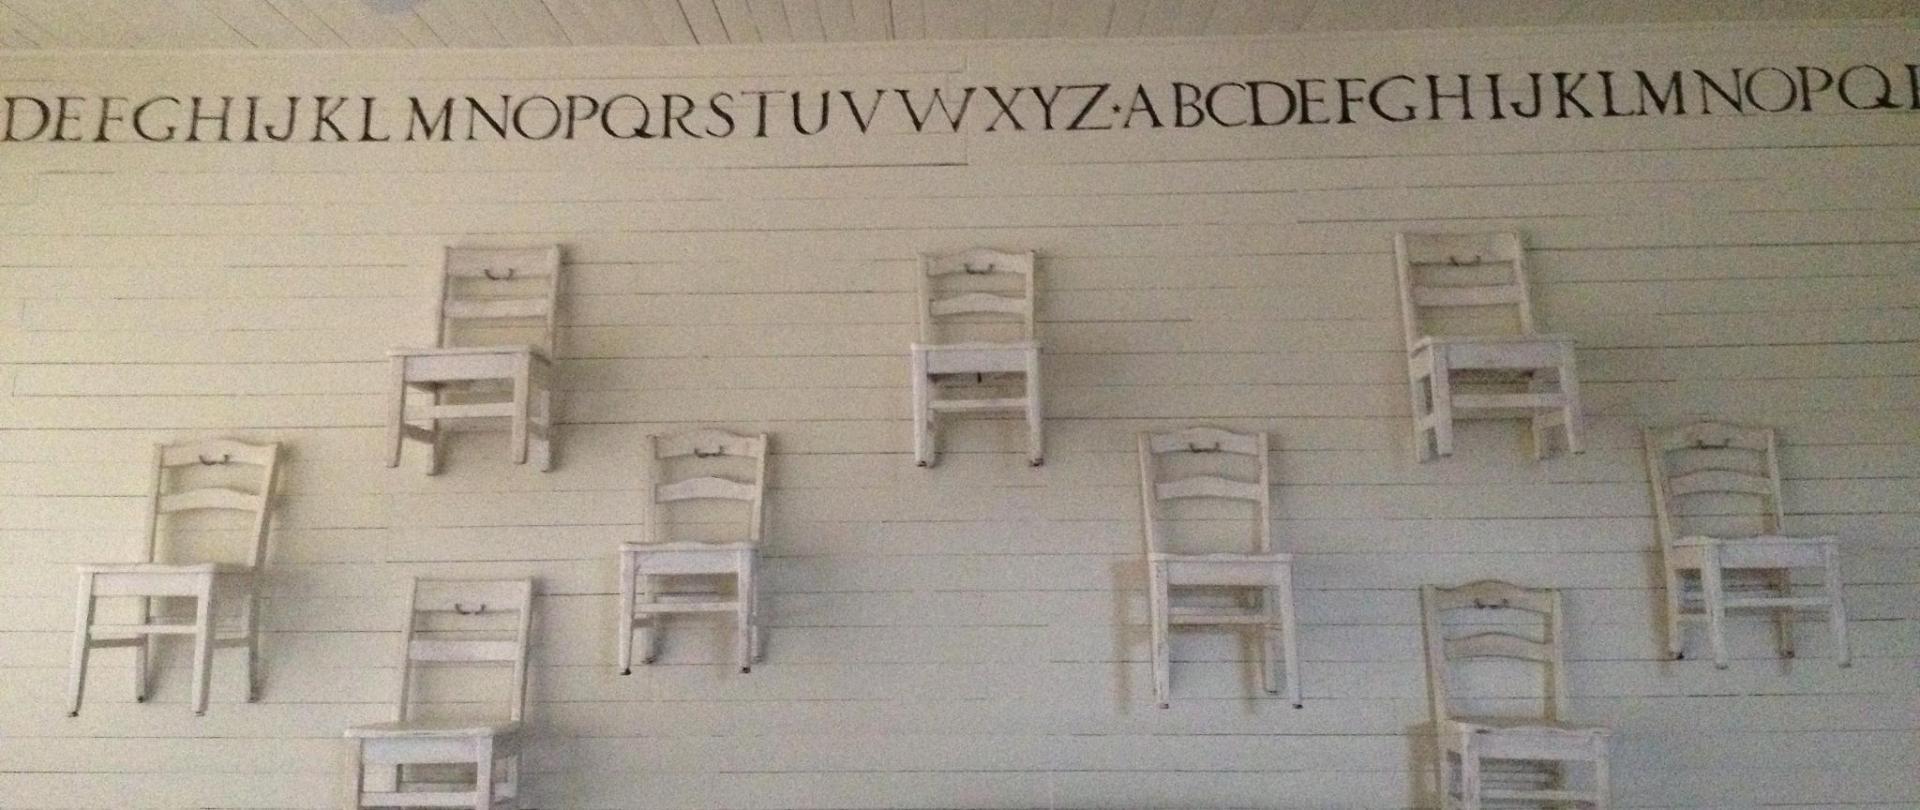 school - childs chairs.jpg